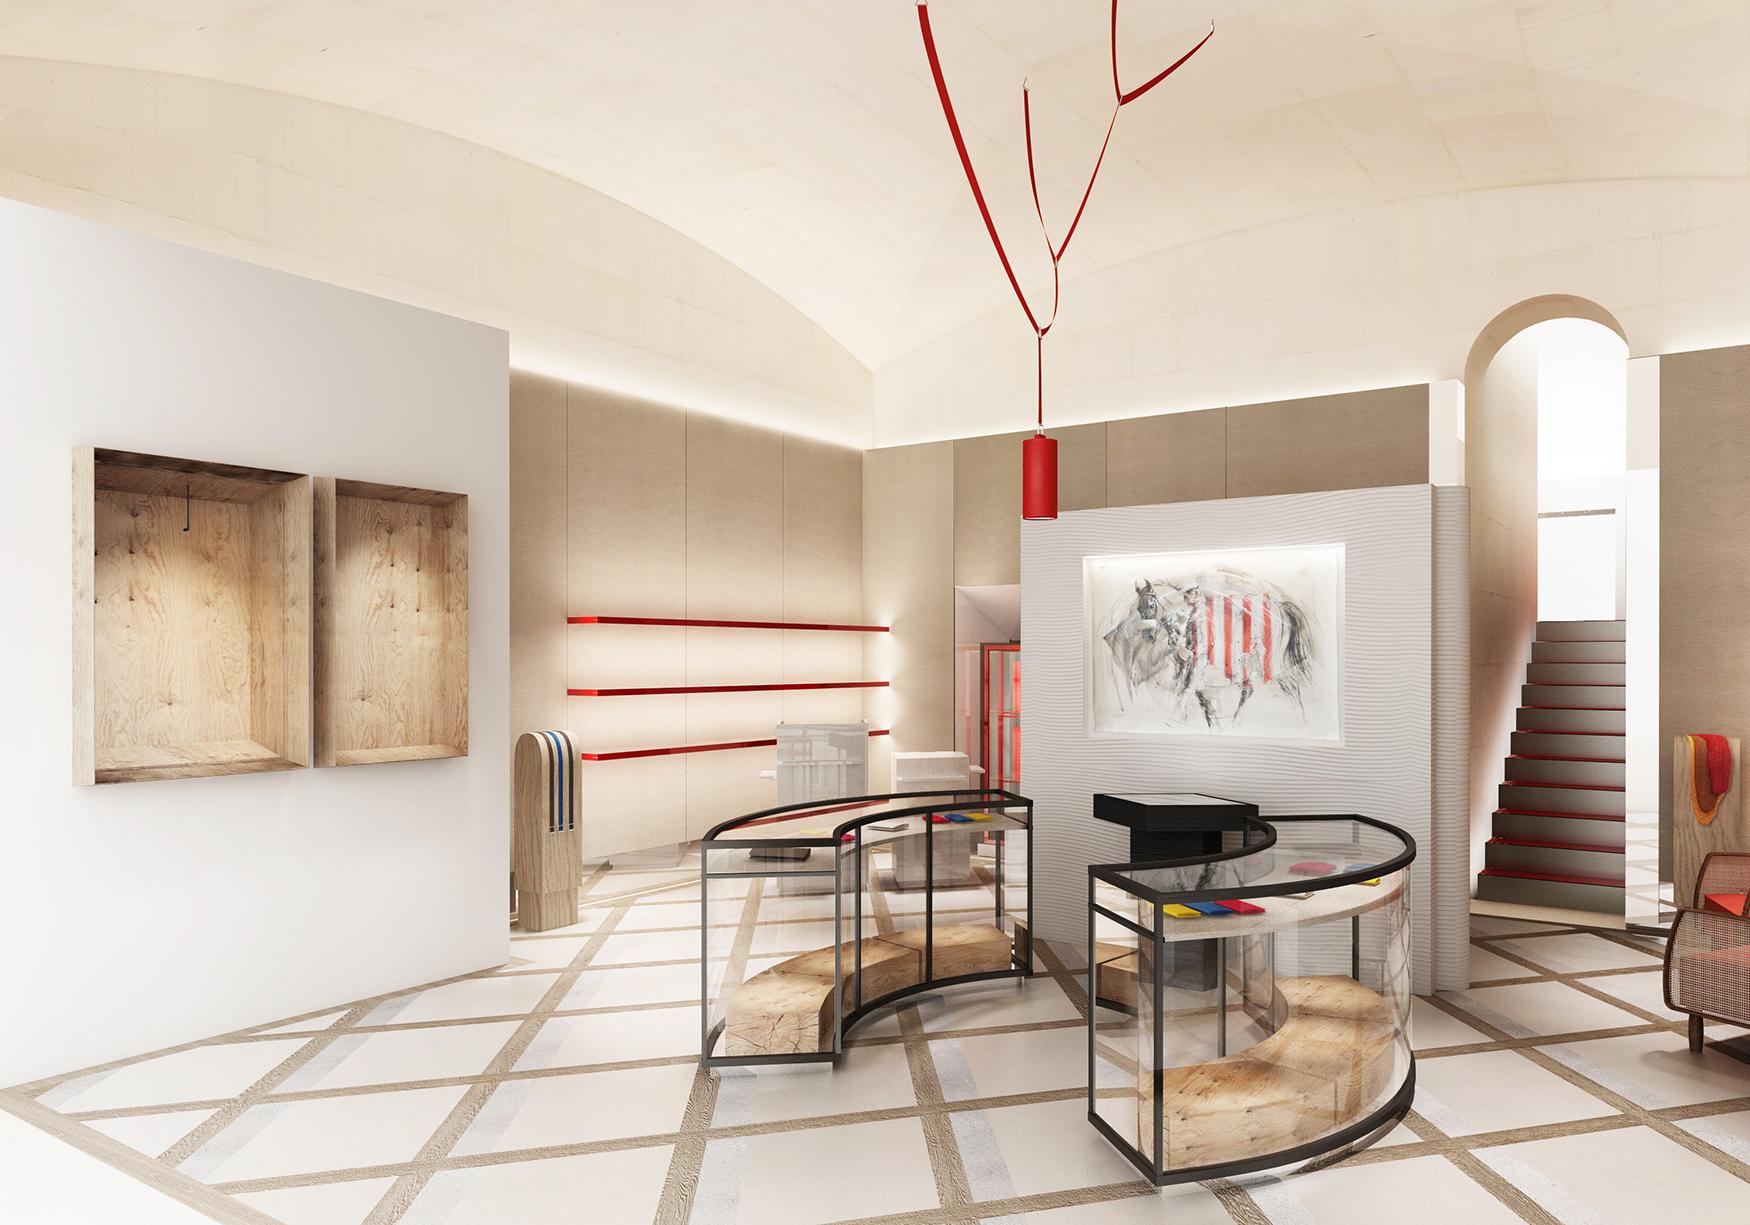 sandrine sarah faivre-architecture-interieure-shopping-2014-GB-01